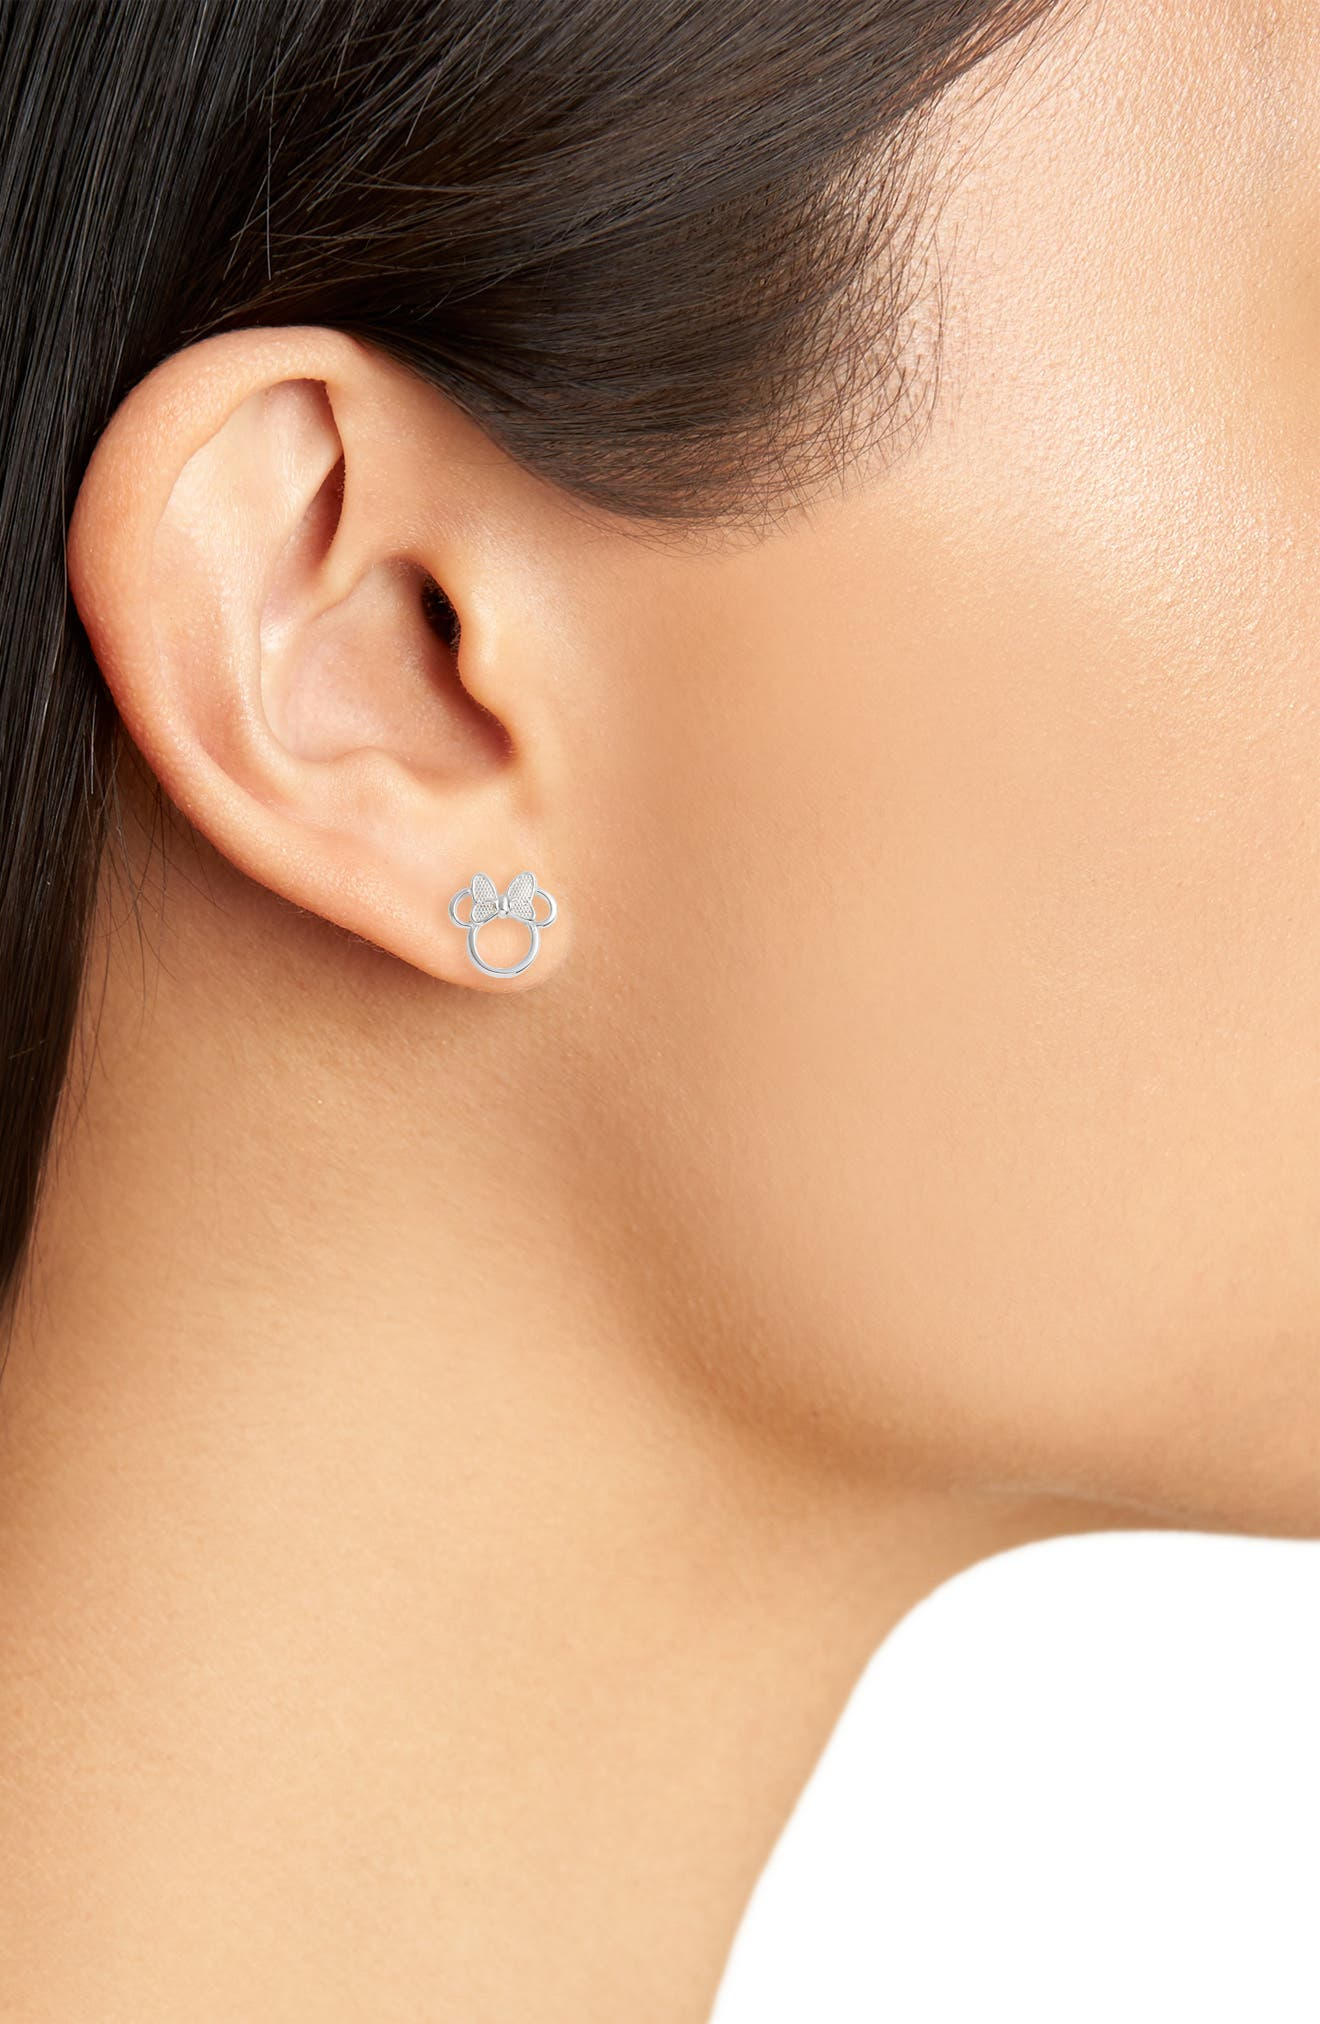 Minnie Mouse Stud Earrings,                             Alternate thumbnail 2, color,                             040